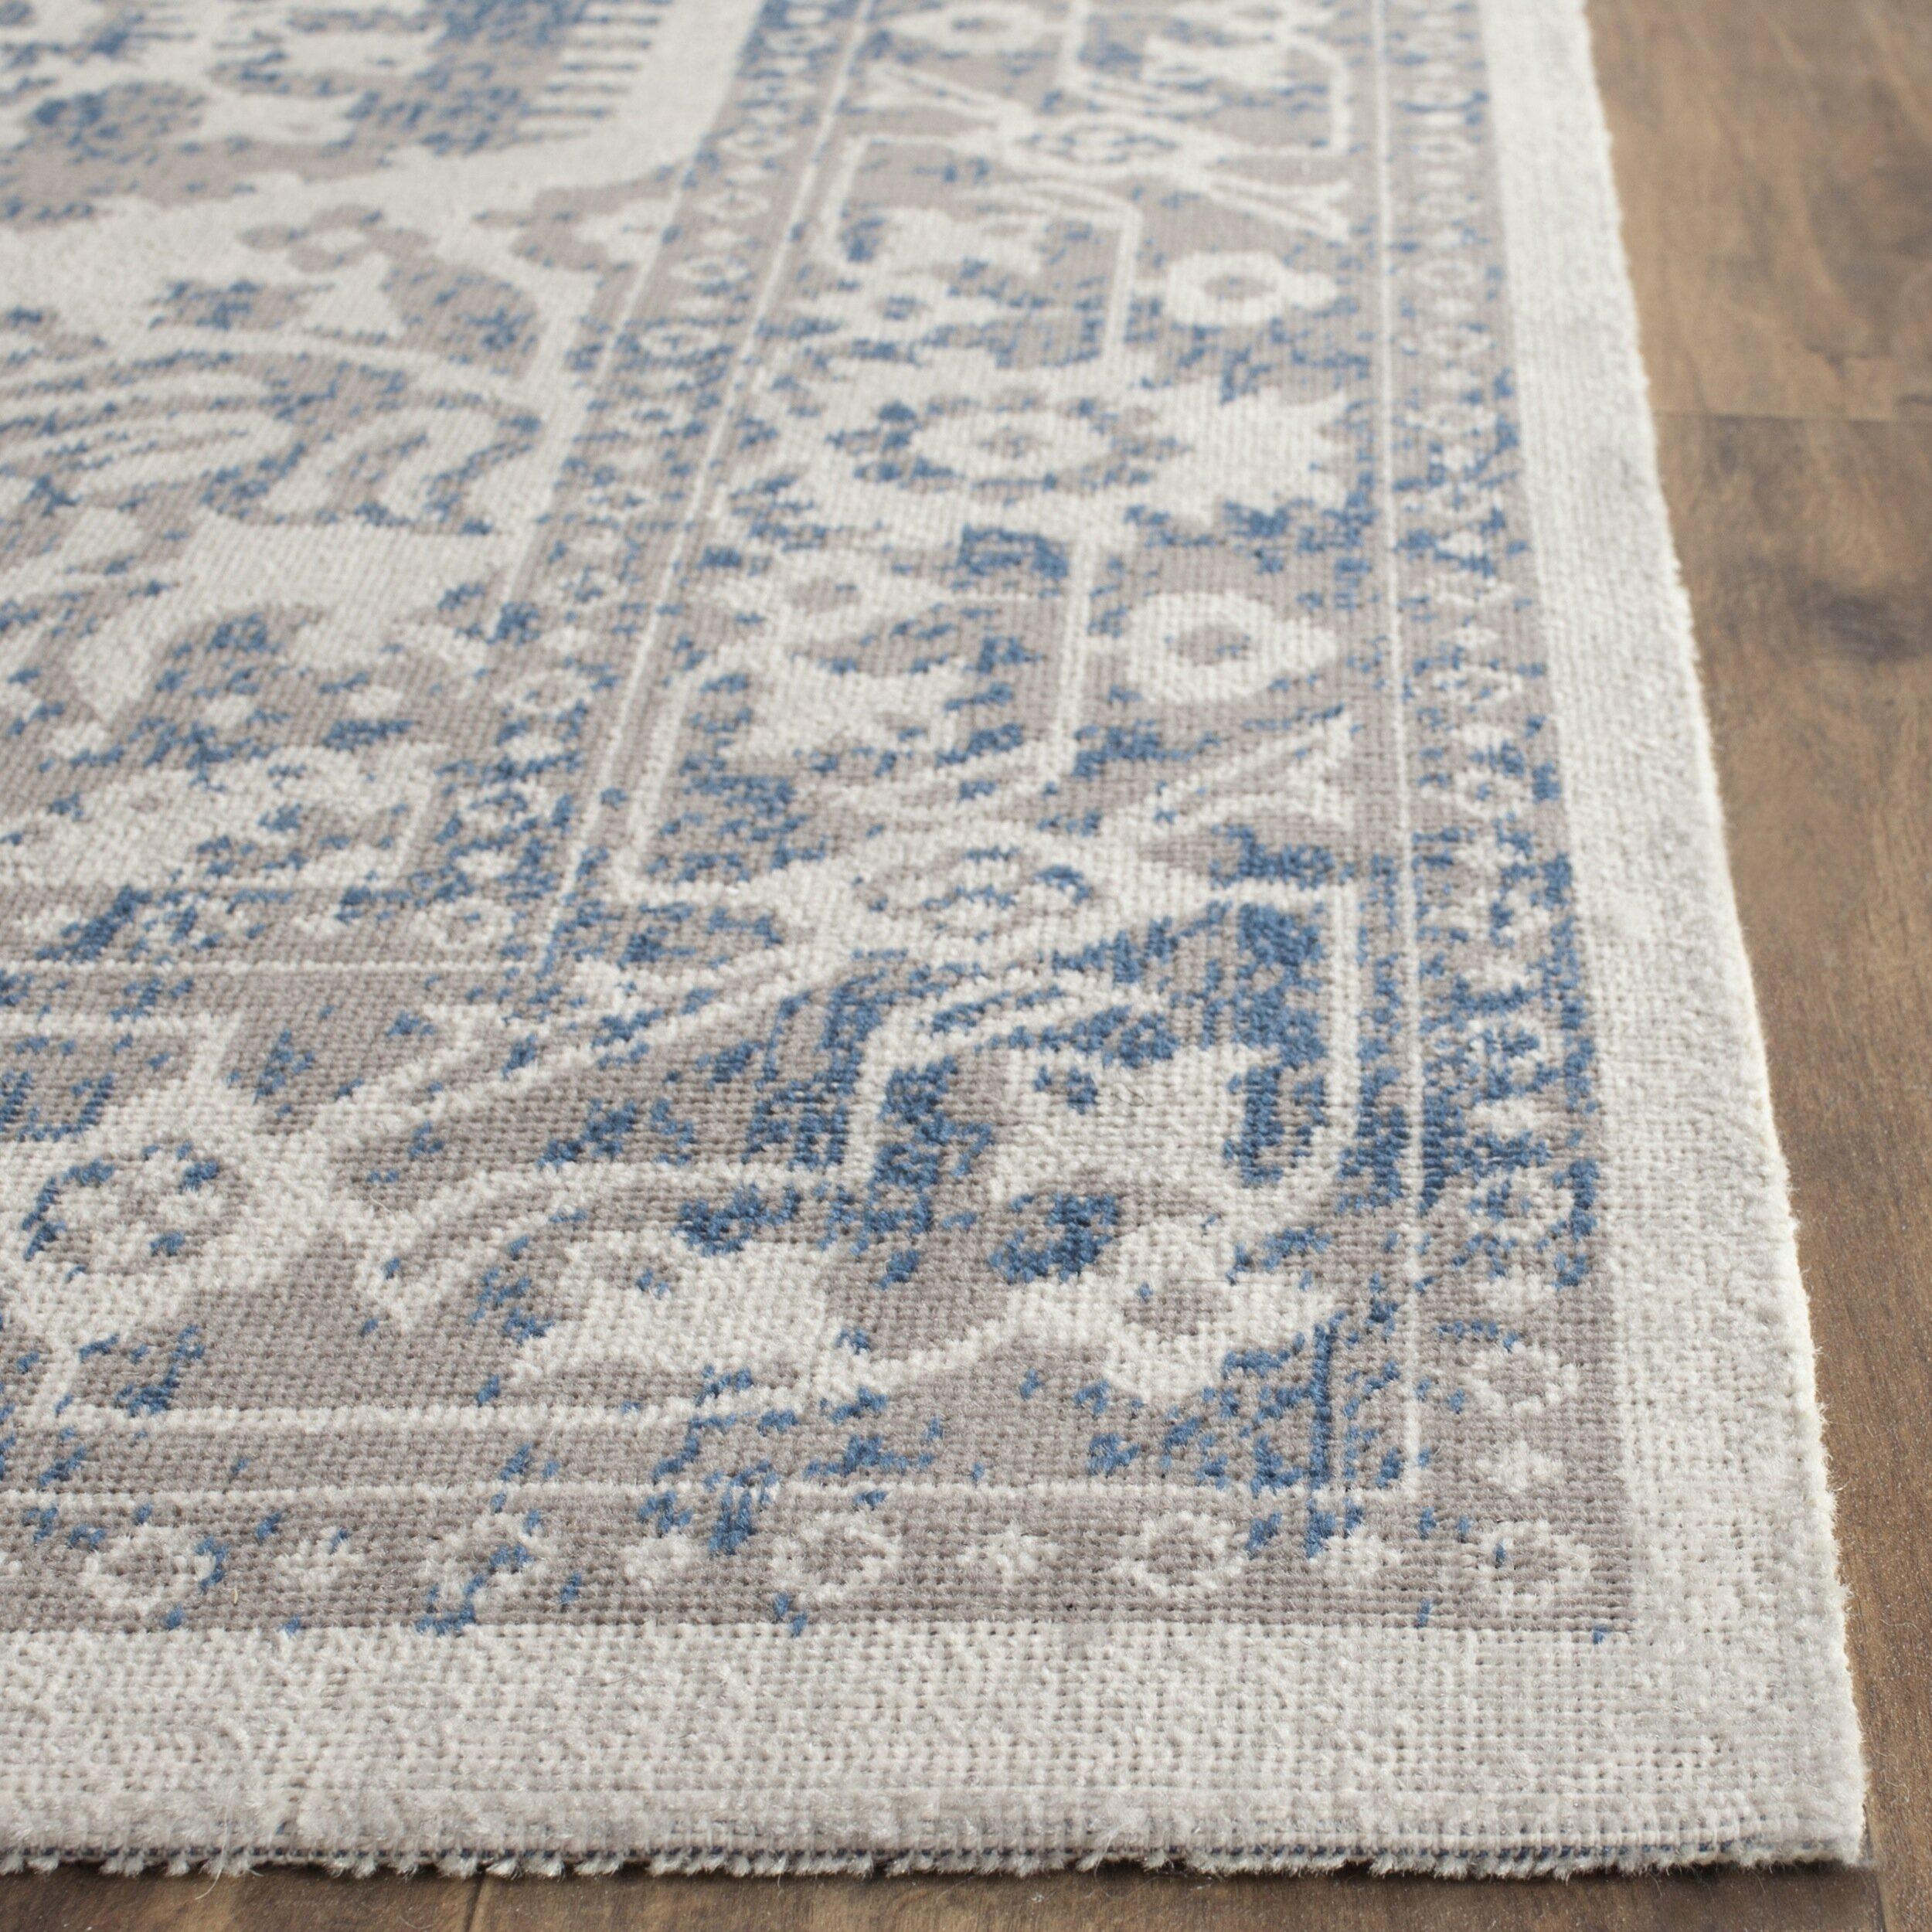 Safavieh patina gray blue area rug amp reviews wayfair